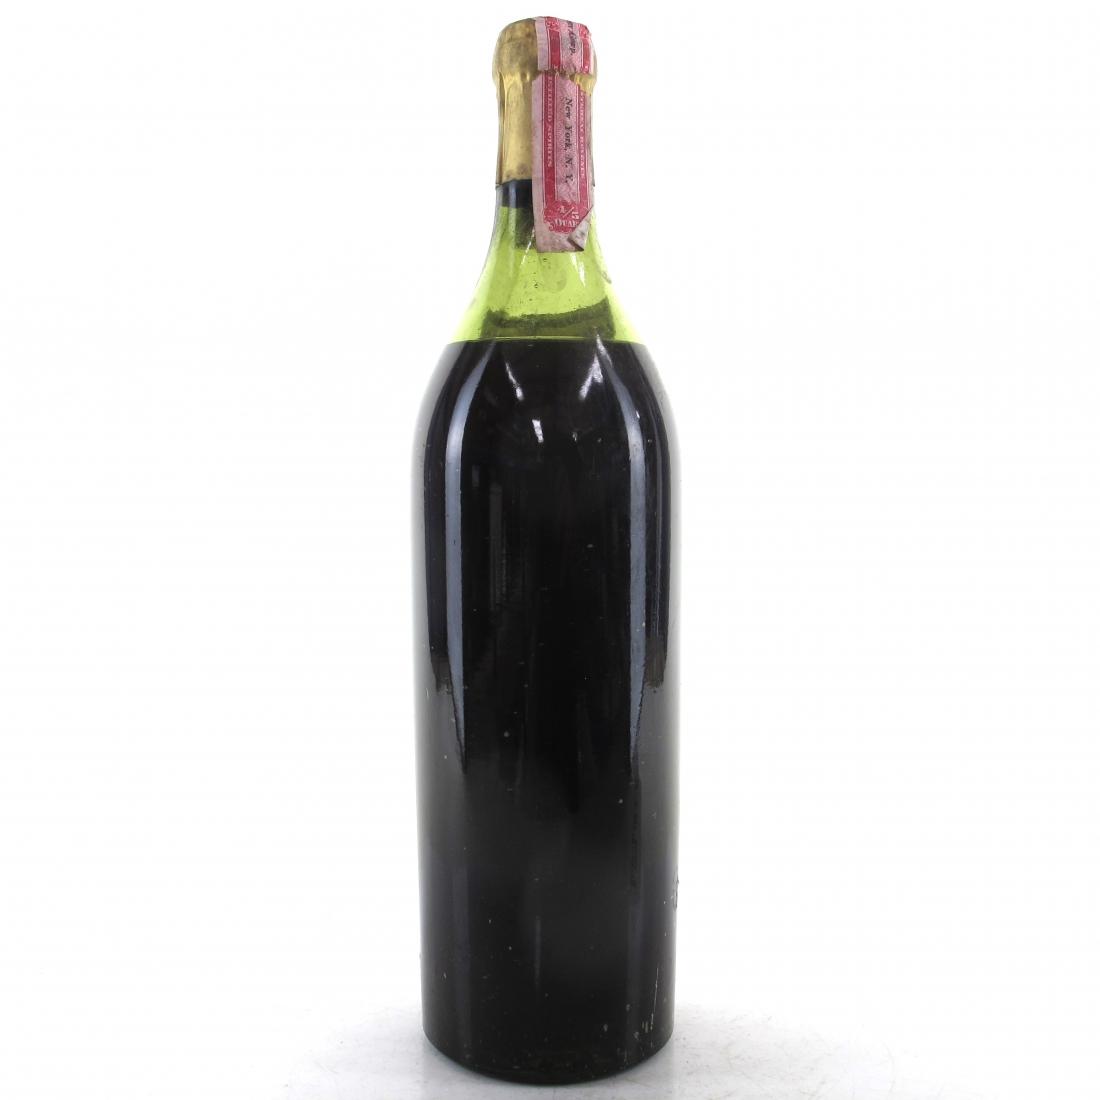 Bodegas del Mundo Nuevo Spanish Brandy 1940s / US Import